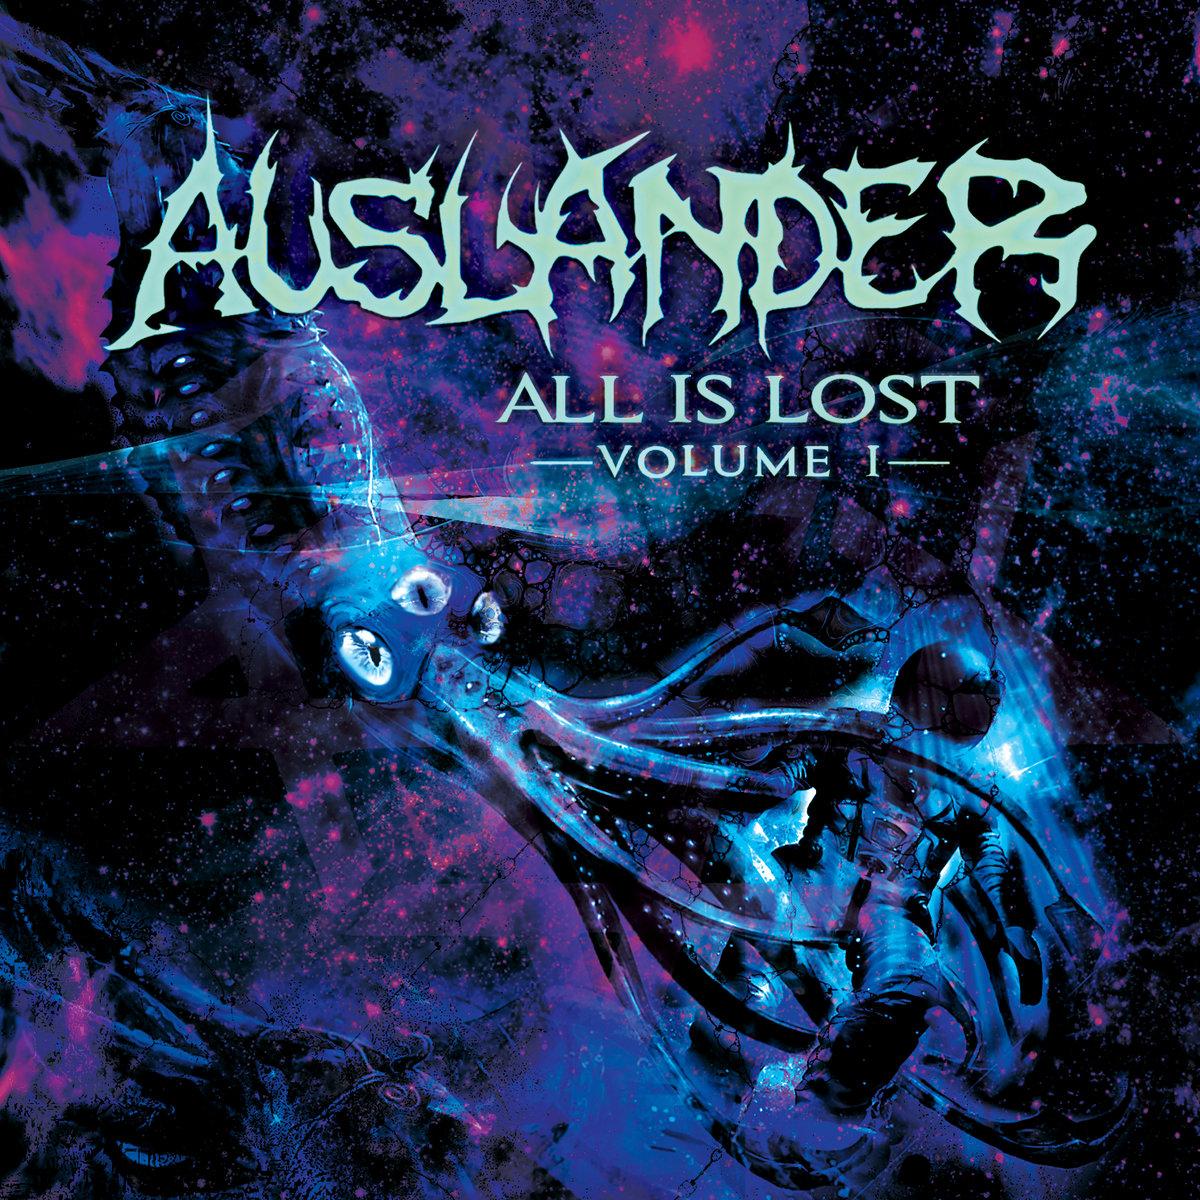 www.facebook.com/auslandermetalband